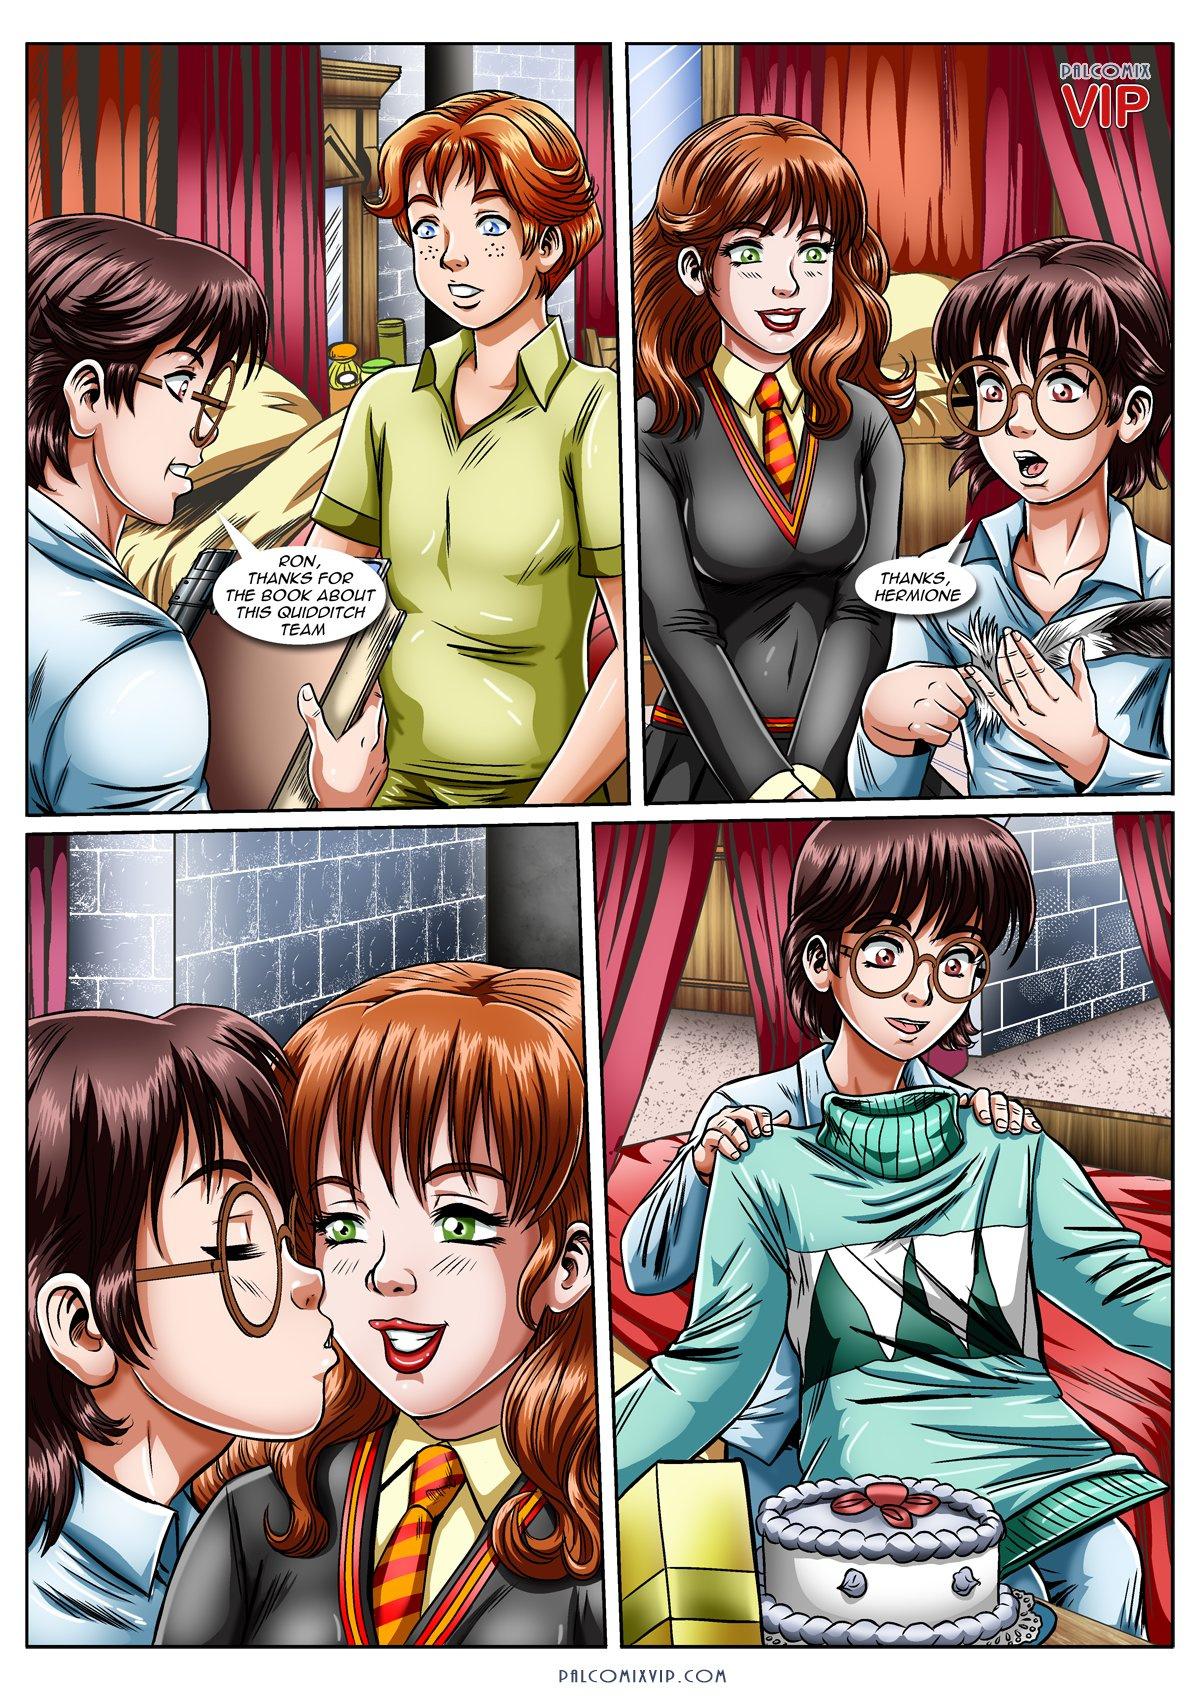 Hermione's Punishment porn comics Oral sex, Anal Sex, Blowjob, Creampie, Cum Shots, Cum Swallow, cunnilingus, Double Penetration, Fantasy, fingering, Glasses, Group Sex, Lolicon, Masturbation, Straight, Straight Shota, Threesome